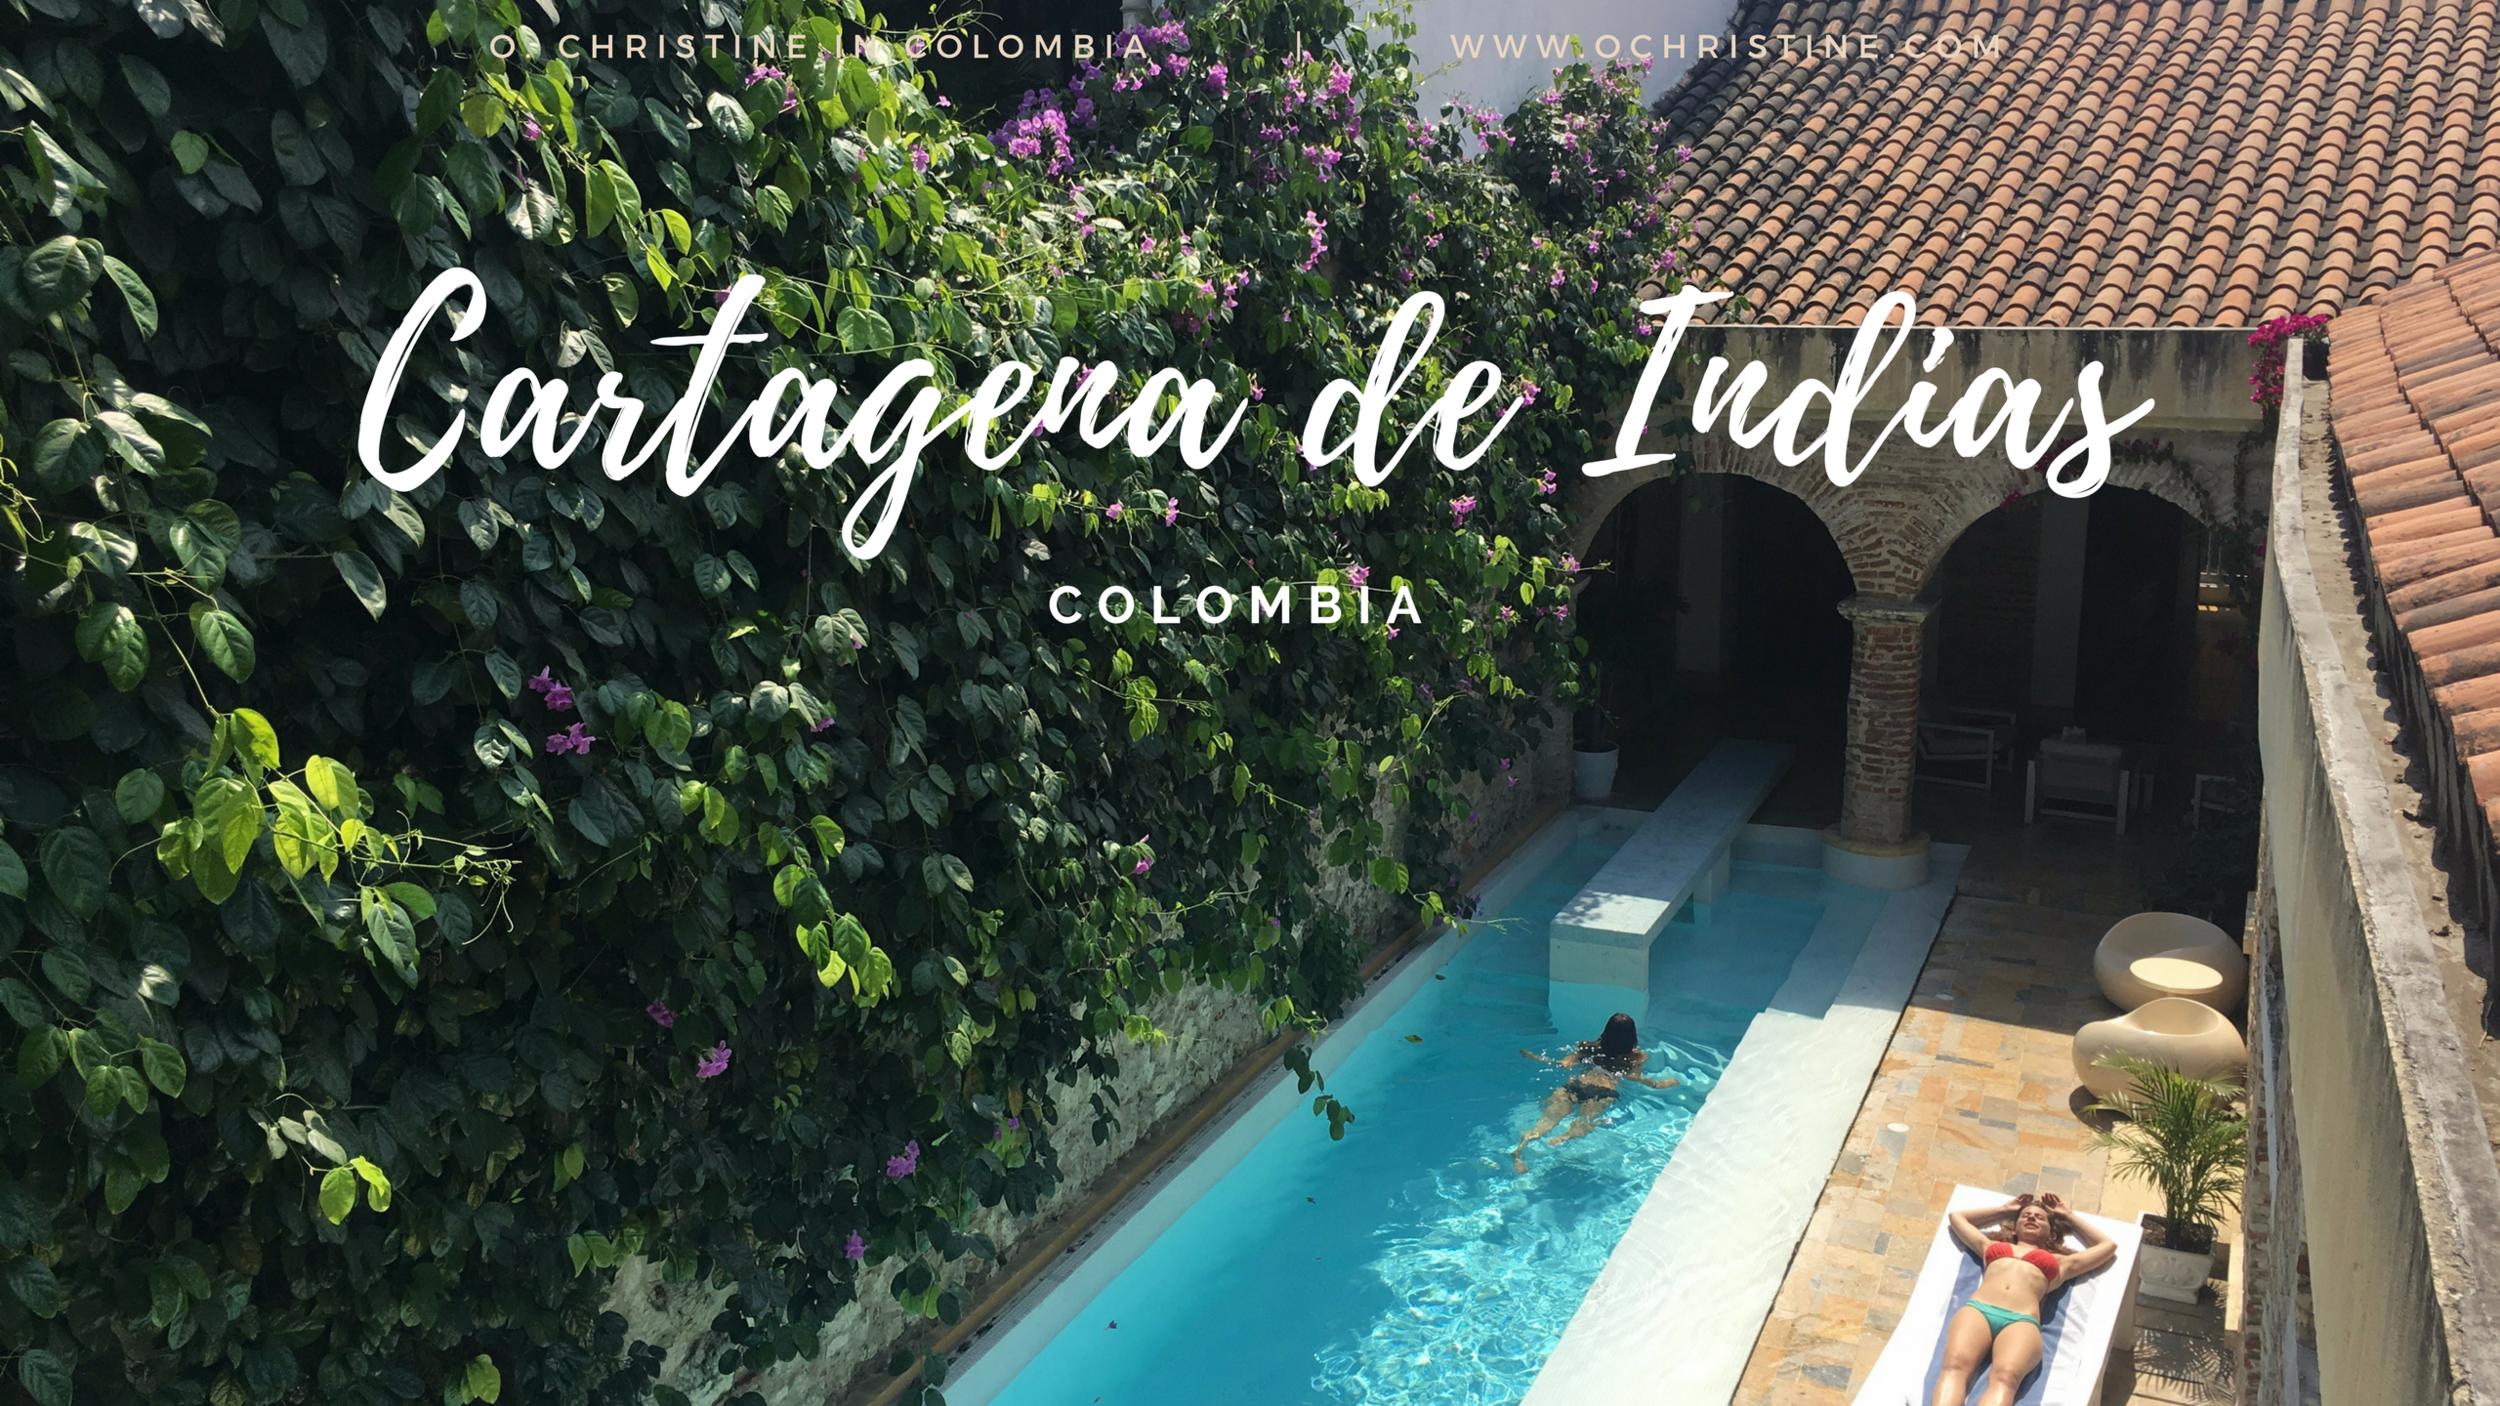 cartagena-colombia-retreats-ochristine